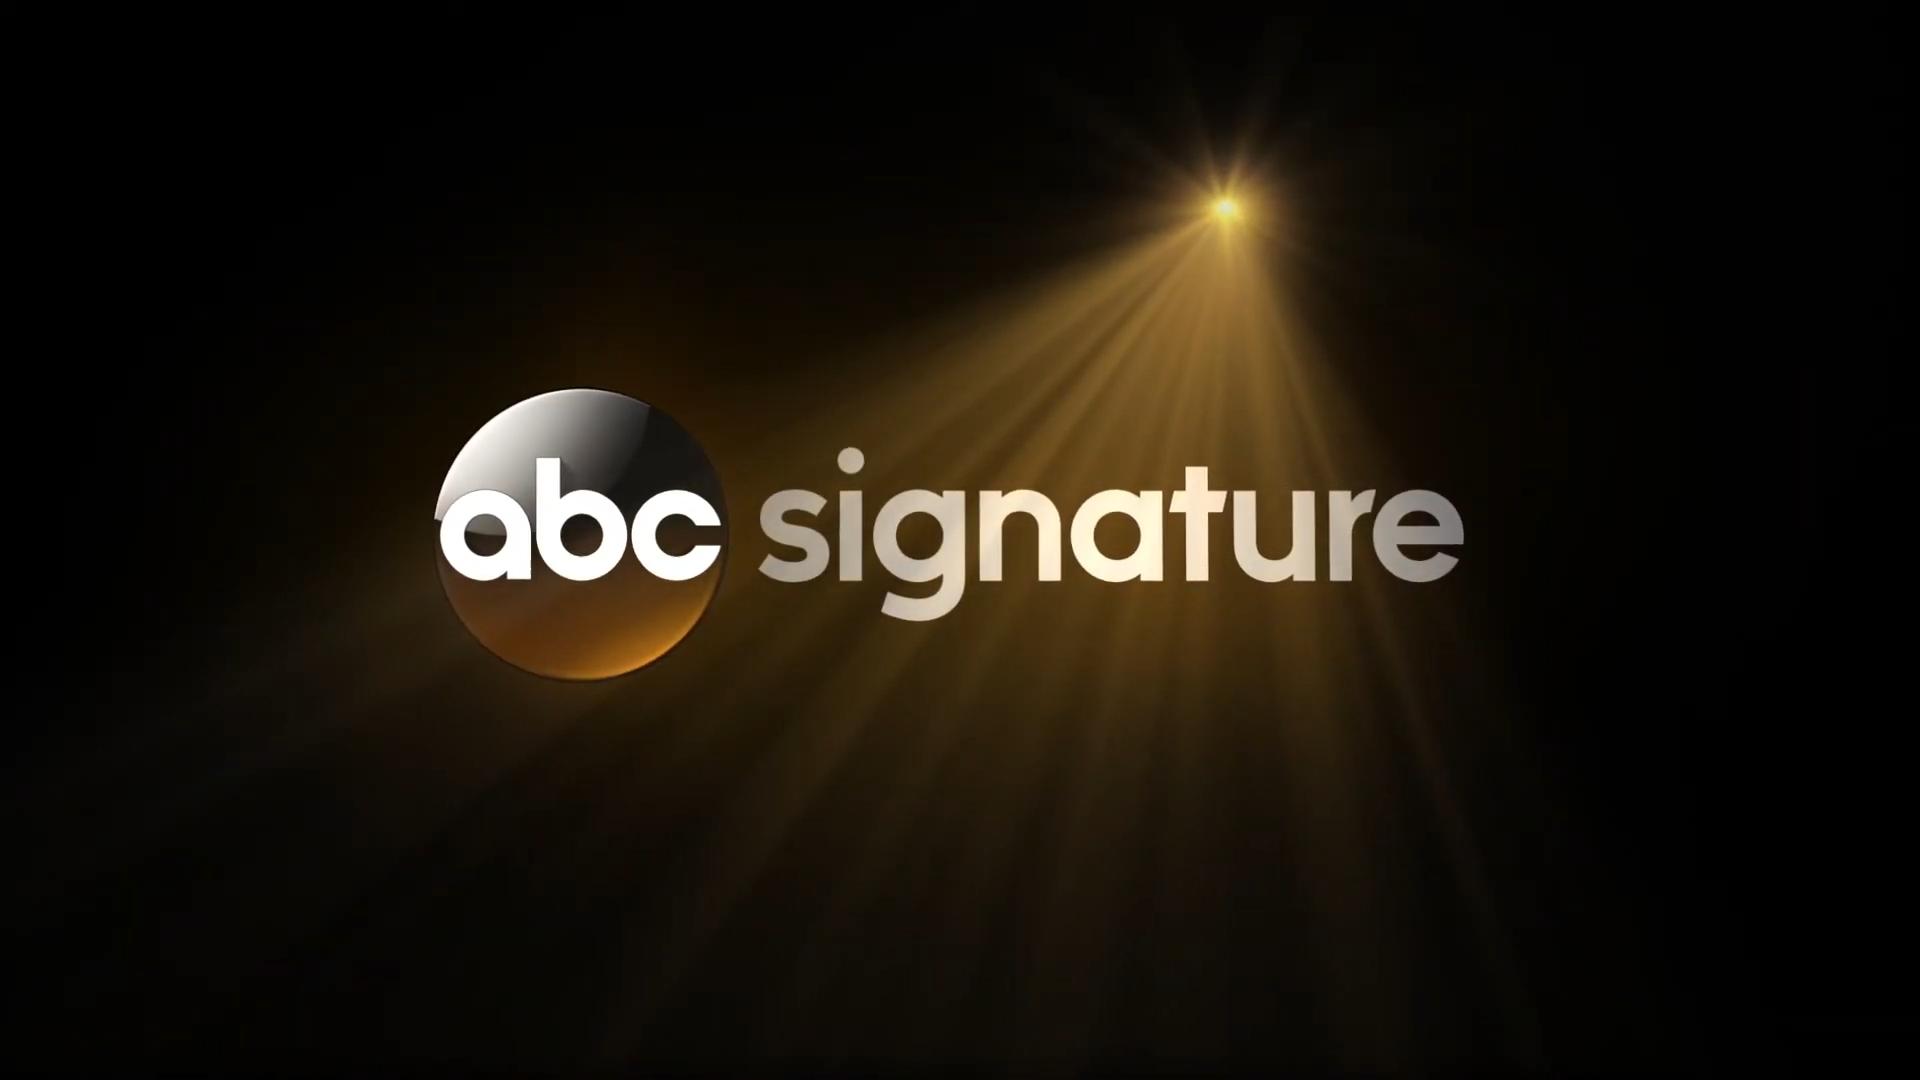 ABC Signature/Other